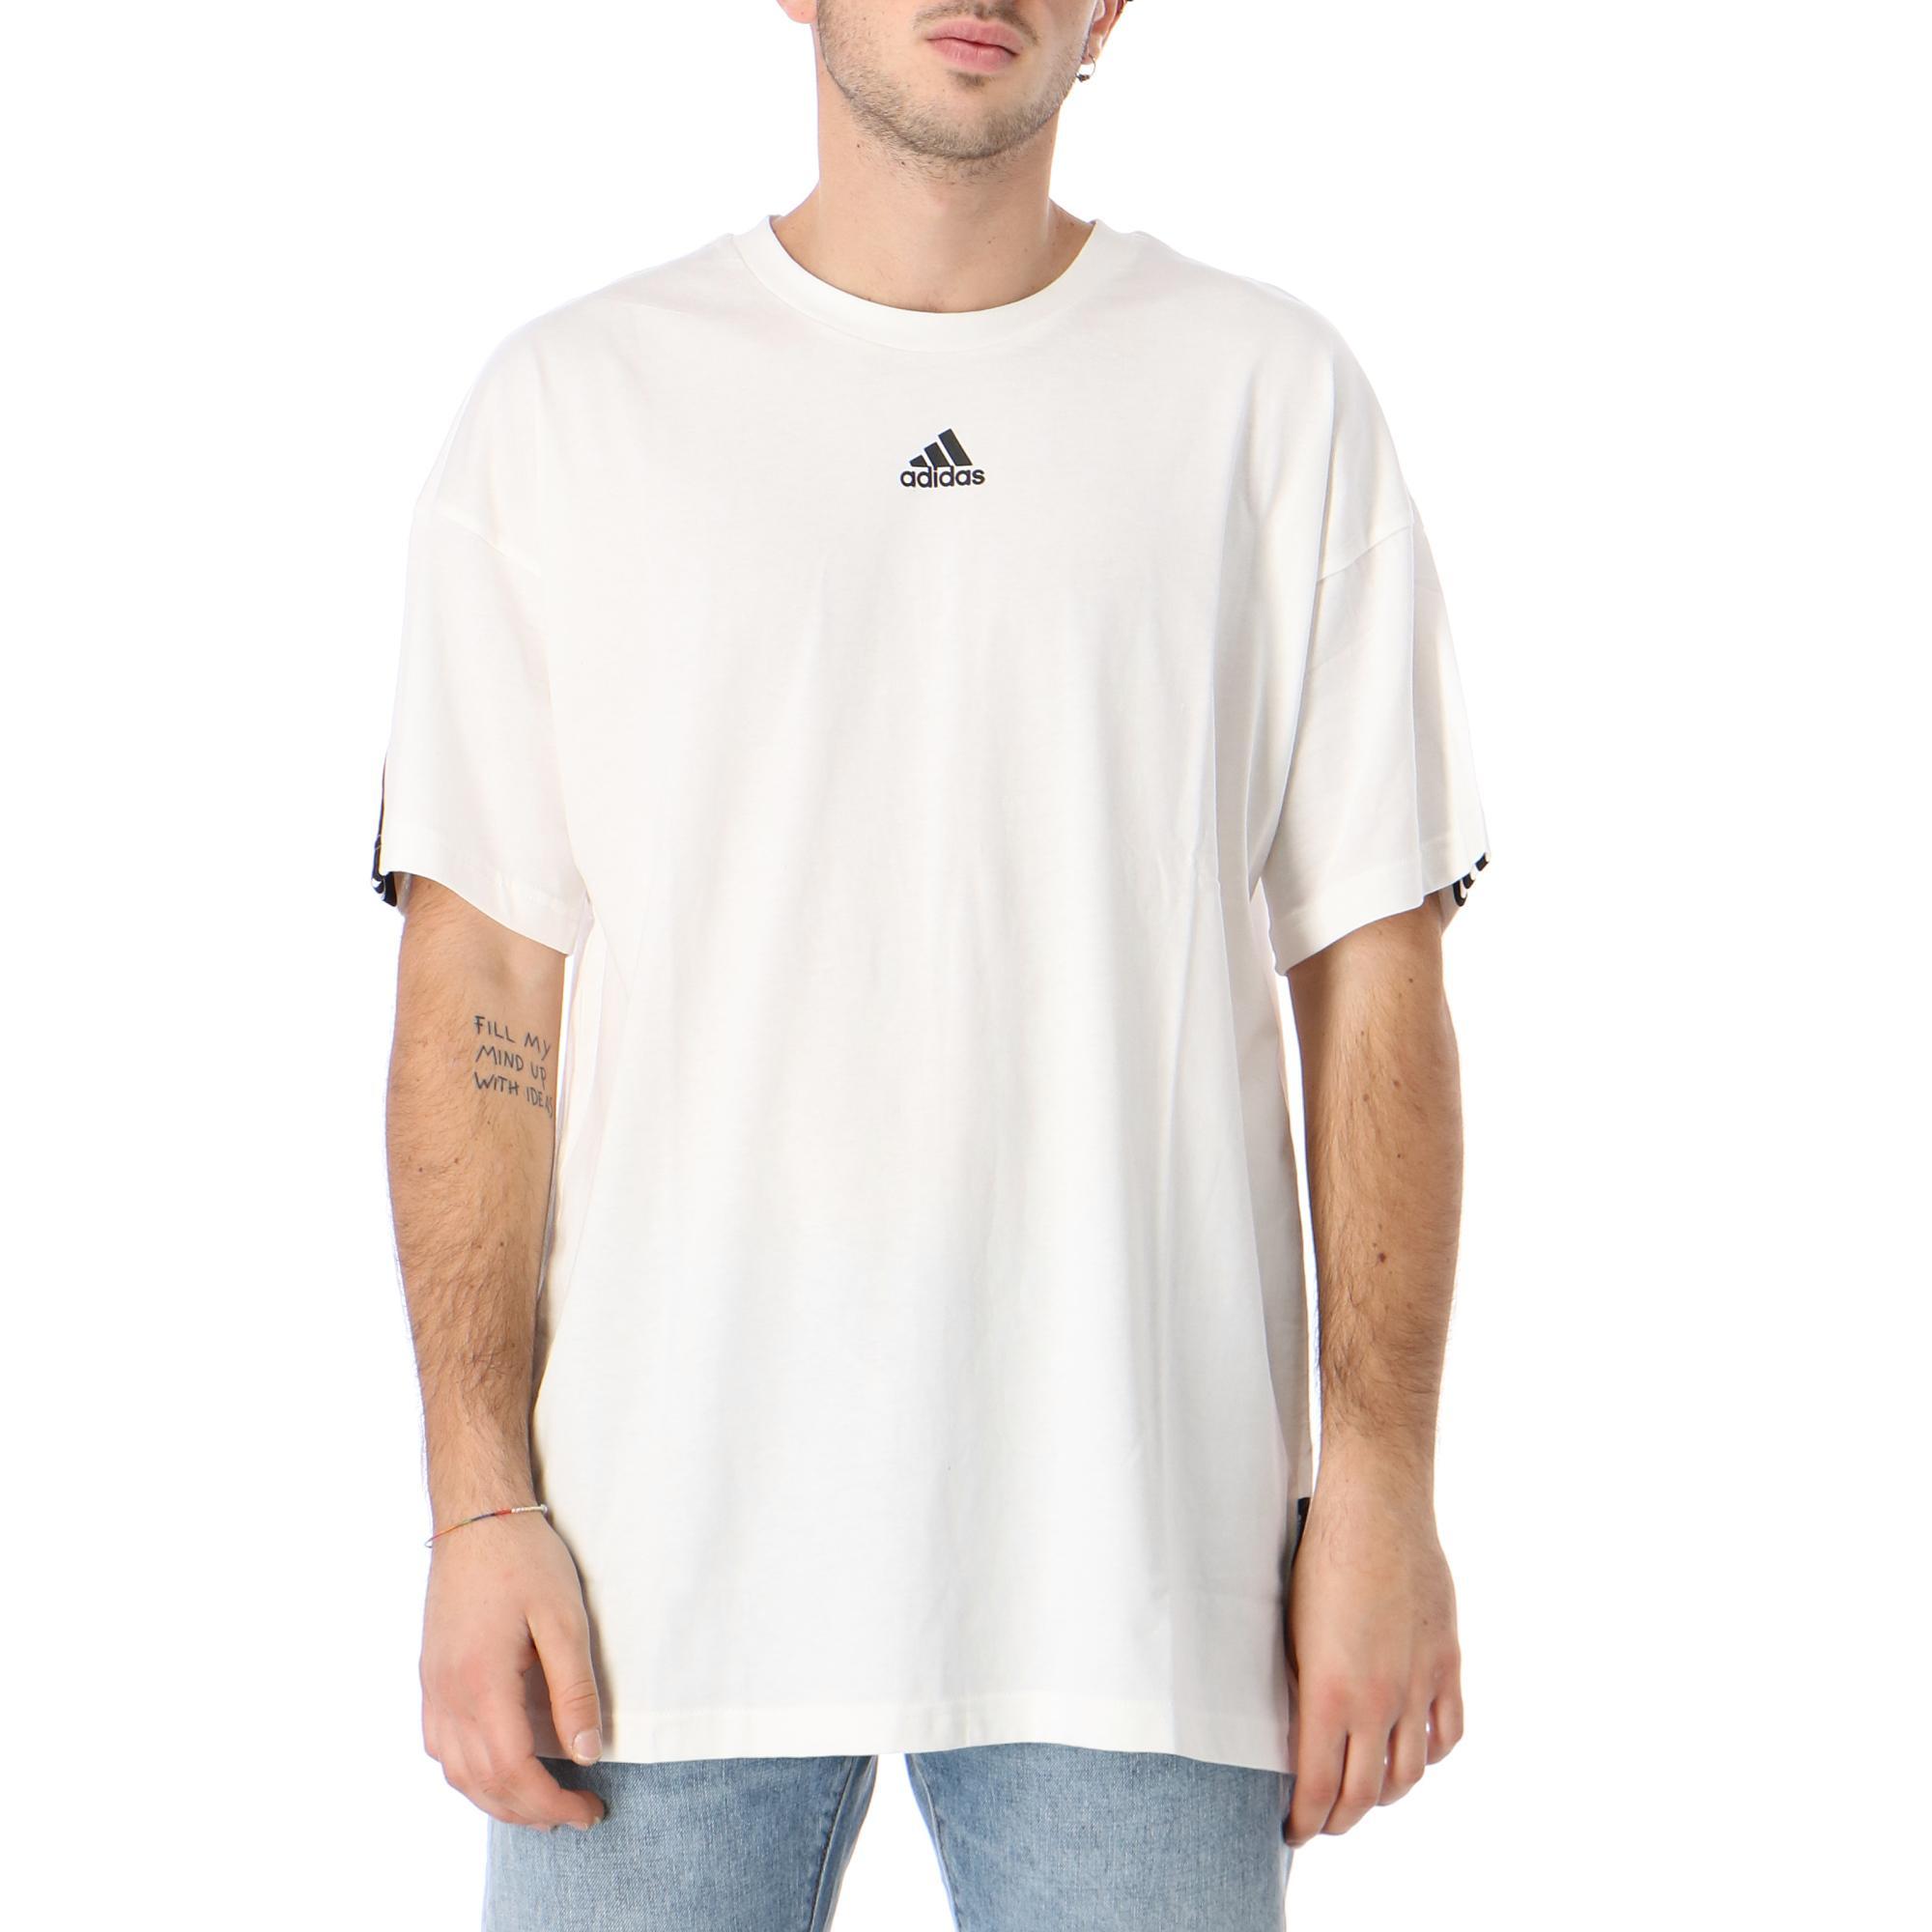 Adidas M Mh 3s Tee WHITE